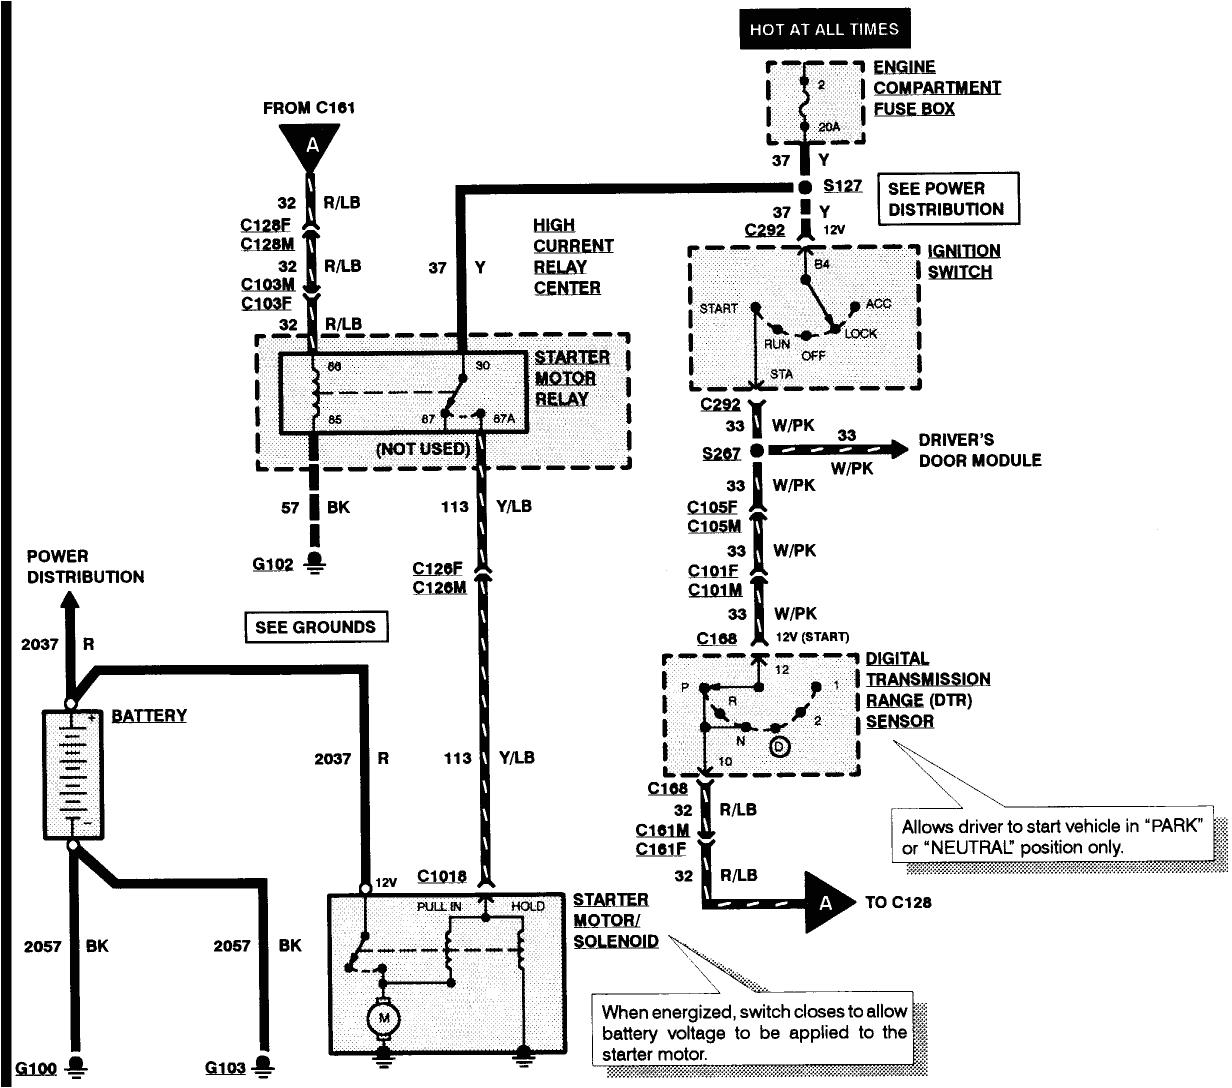 ford f 150 solenoid diagram wiring diagram expert 1984 ford f150 solenoid wiring diagram 1984 ford f 150 solenoid wiring diagram